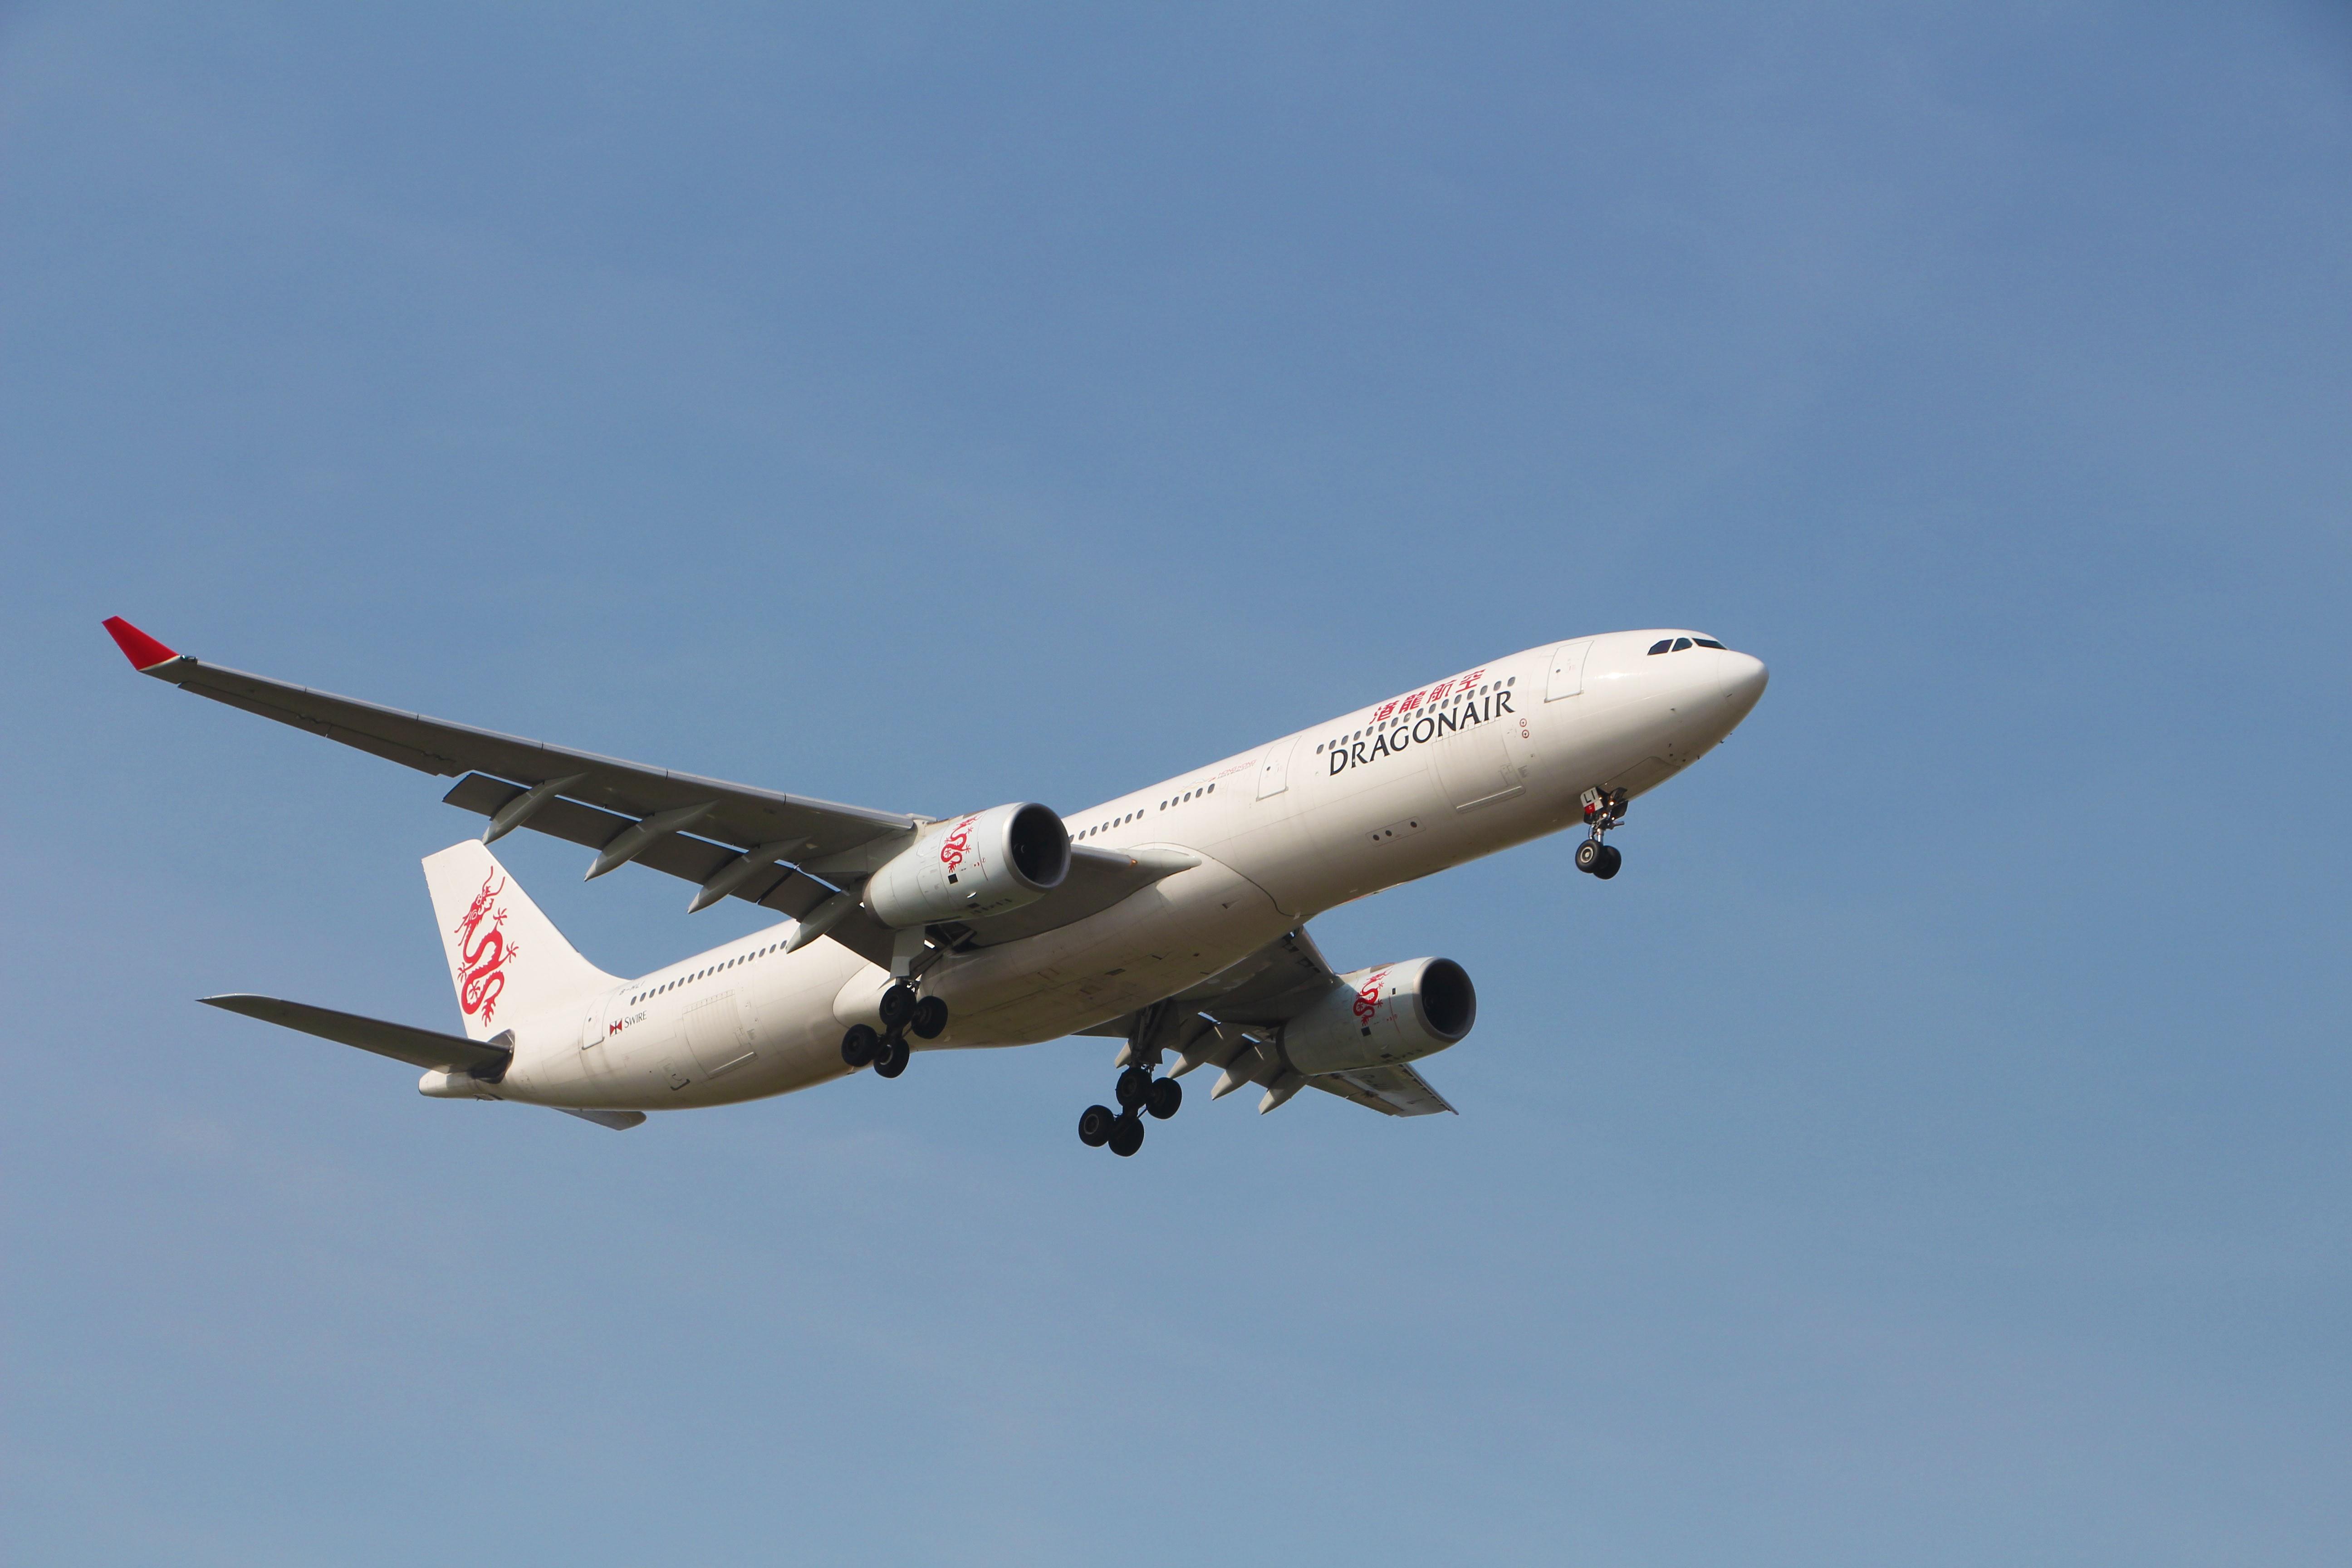 Re:[原创]浦东拍机大作战 AIRBUS A330-300 B-HLI 中国上海浦东国际机场